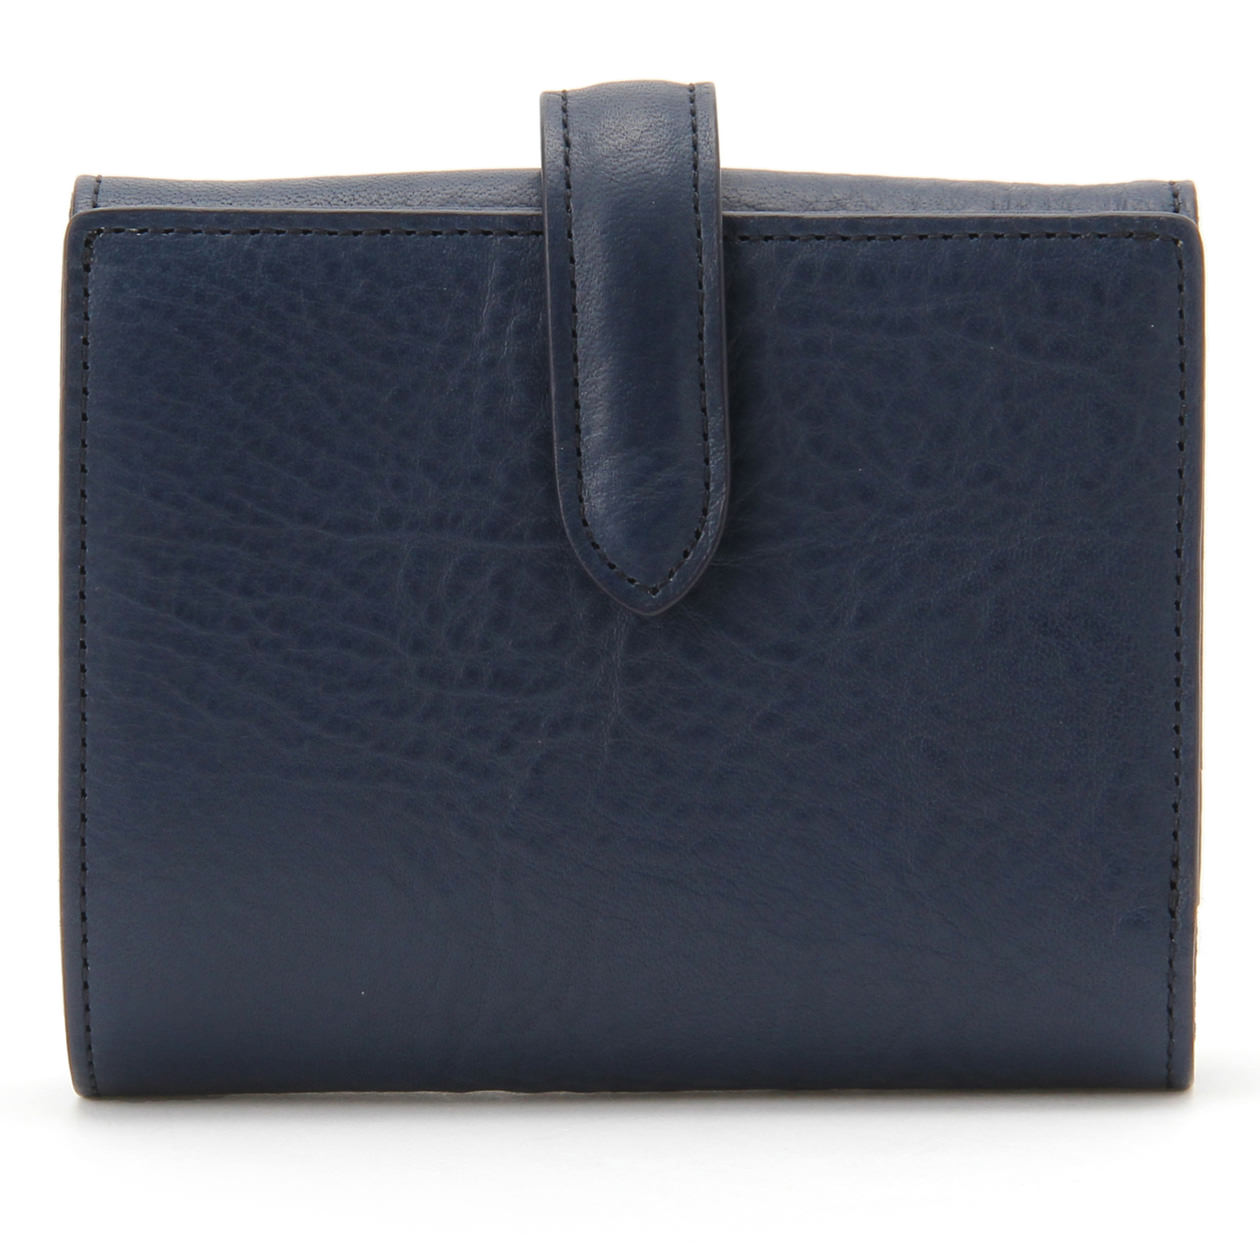 FRAMeWORK(フレームワーク)の無印良品2つ折り財布イタリア産ヌメ革ダーク